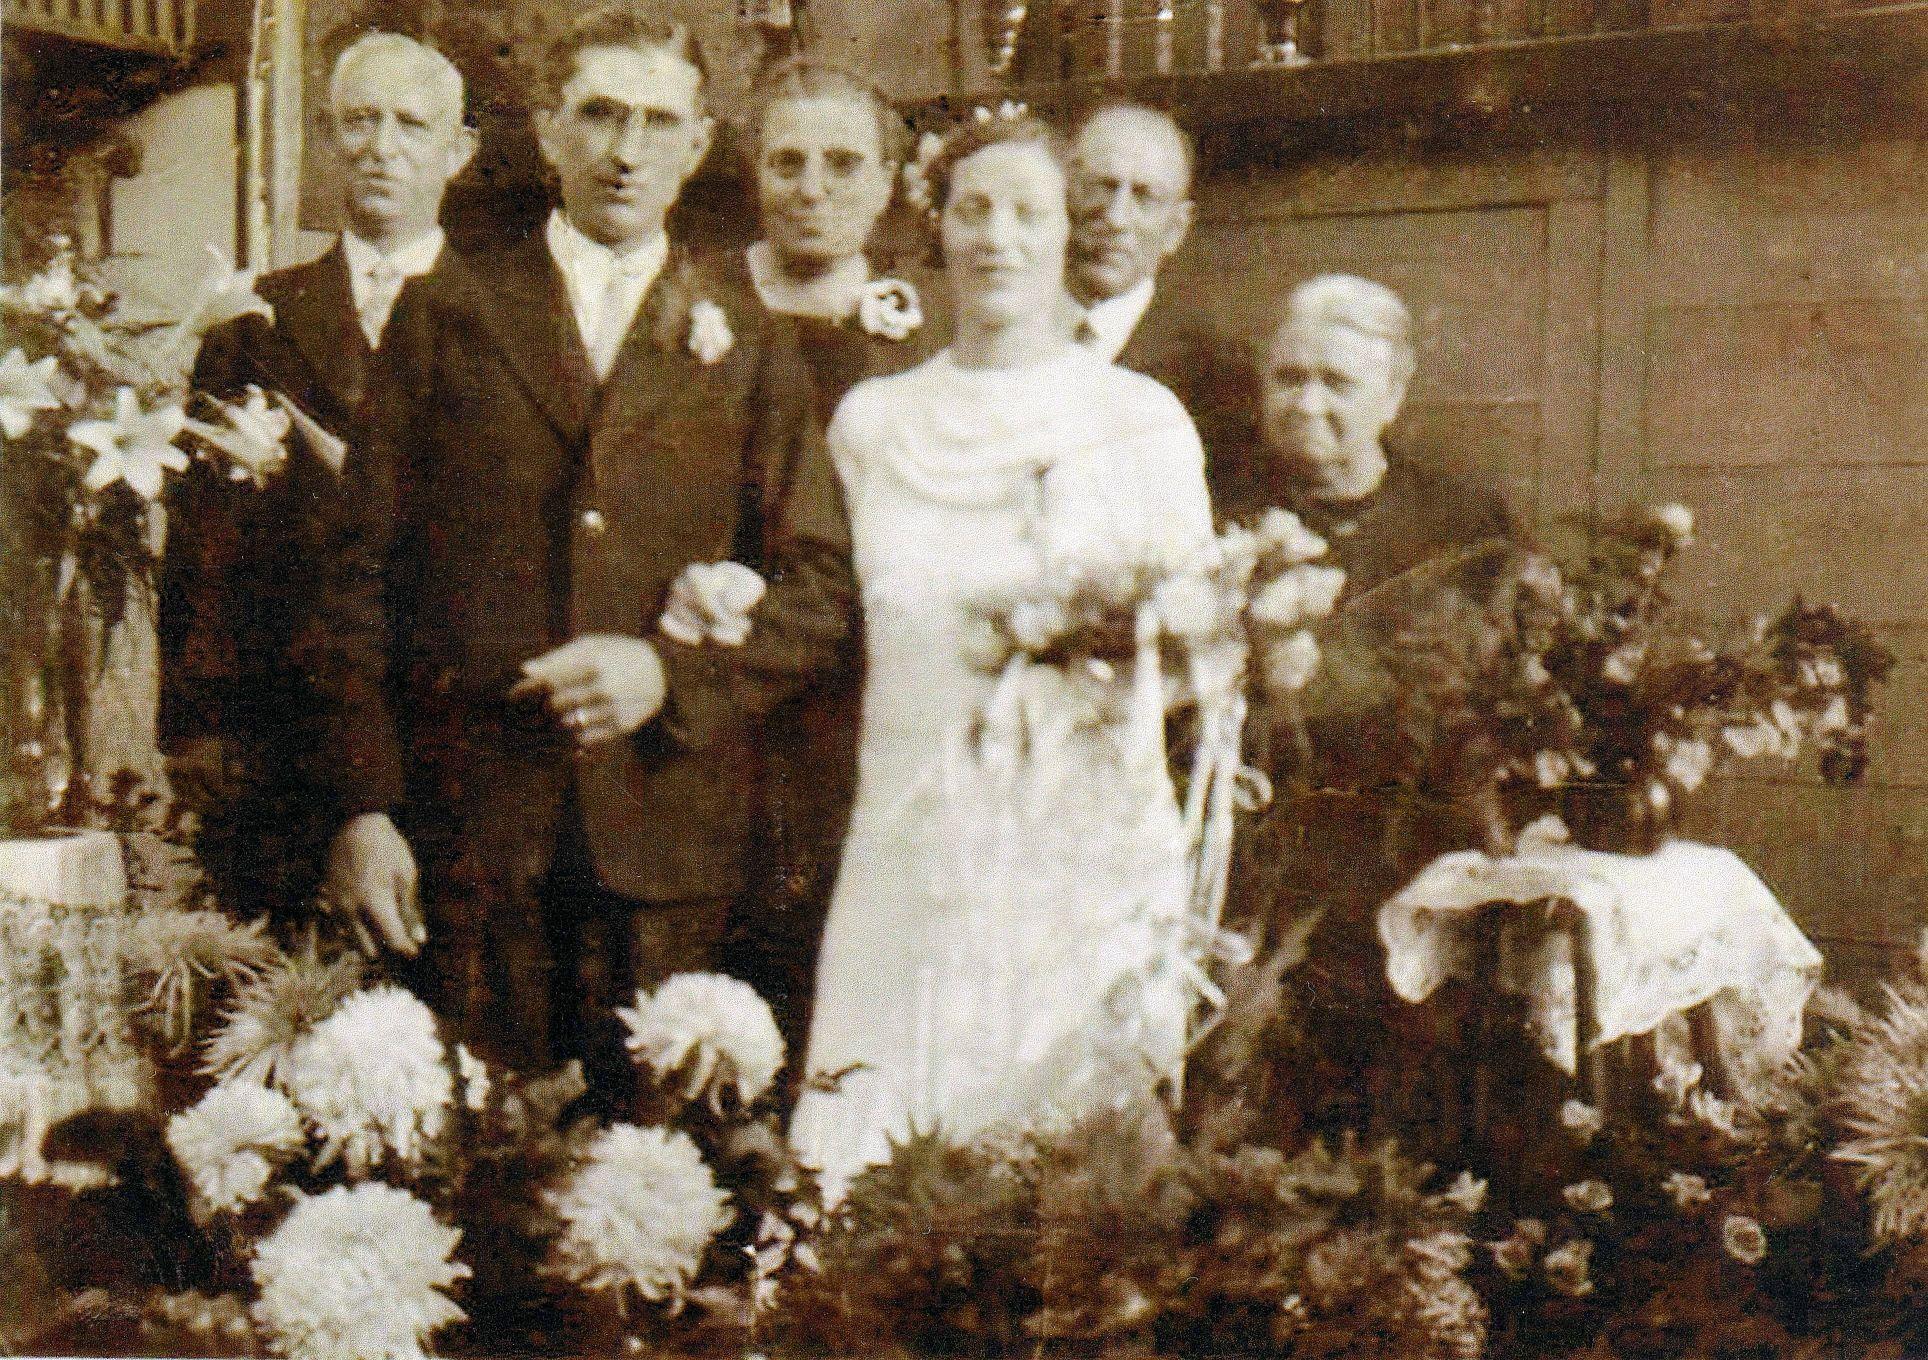 Andreas Johannes Agterberg (1877-1946), Pieter Maria Brouwer (1912-2005), Maria Johanna Elsendoorn (1878-), Maria Johanna Agterberg (1912-1990), JA Brouwer (1873-1954), GE van Vessem (1875-1939)